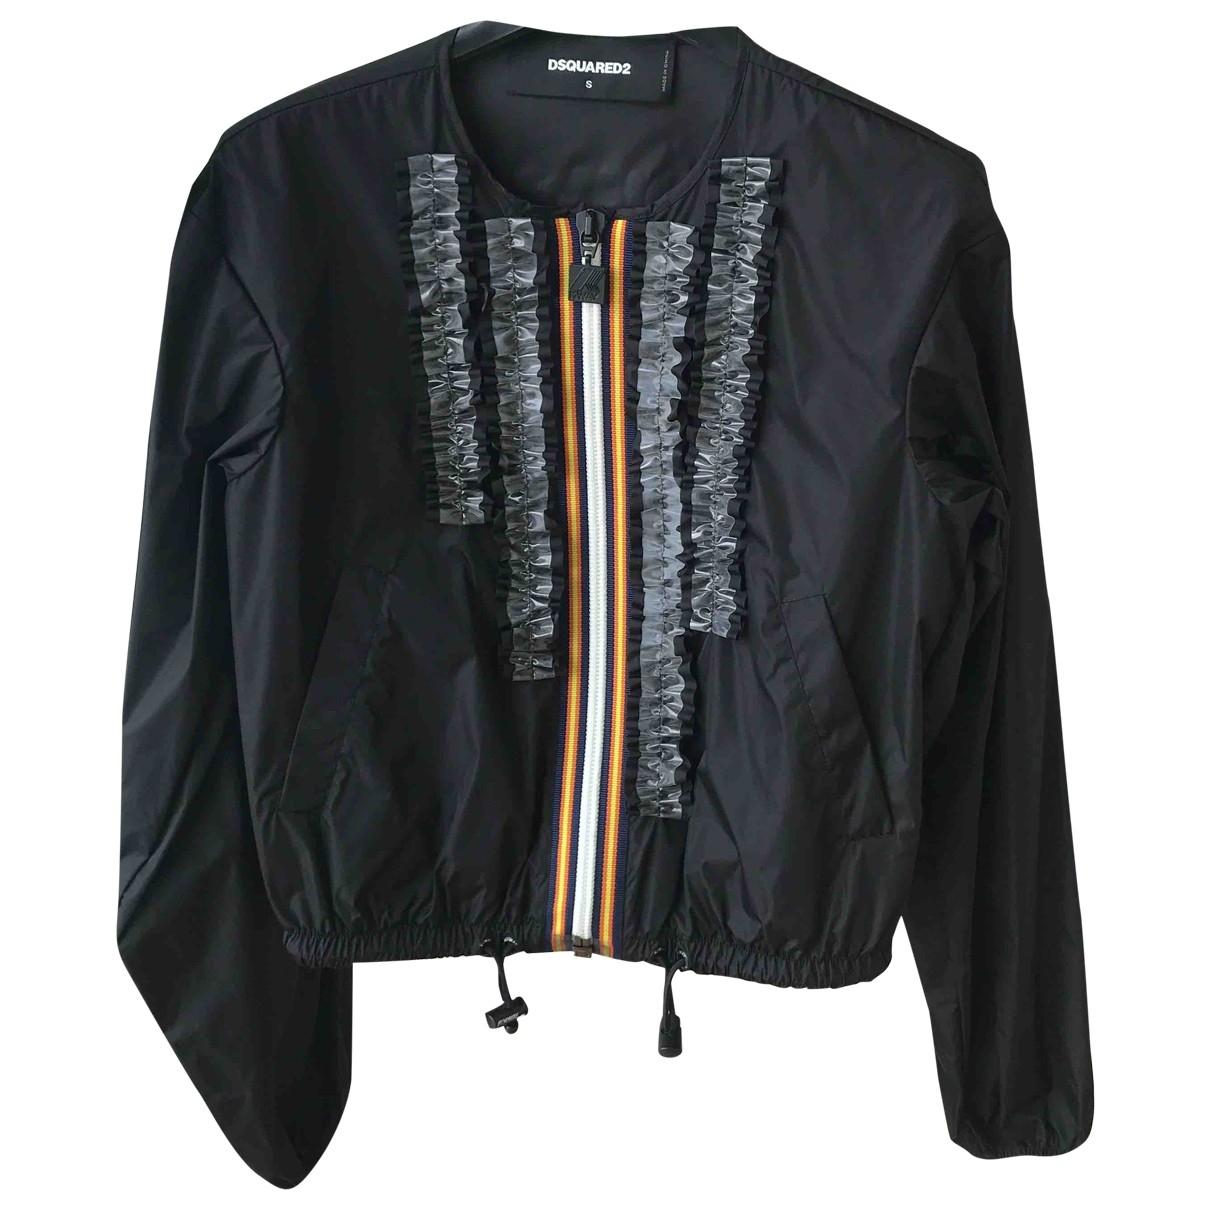 Dsquared2 \N Black Leather jacket for Women S International